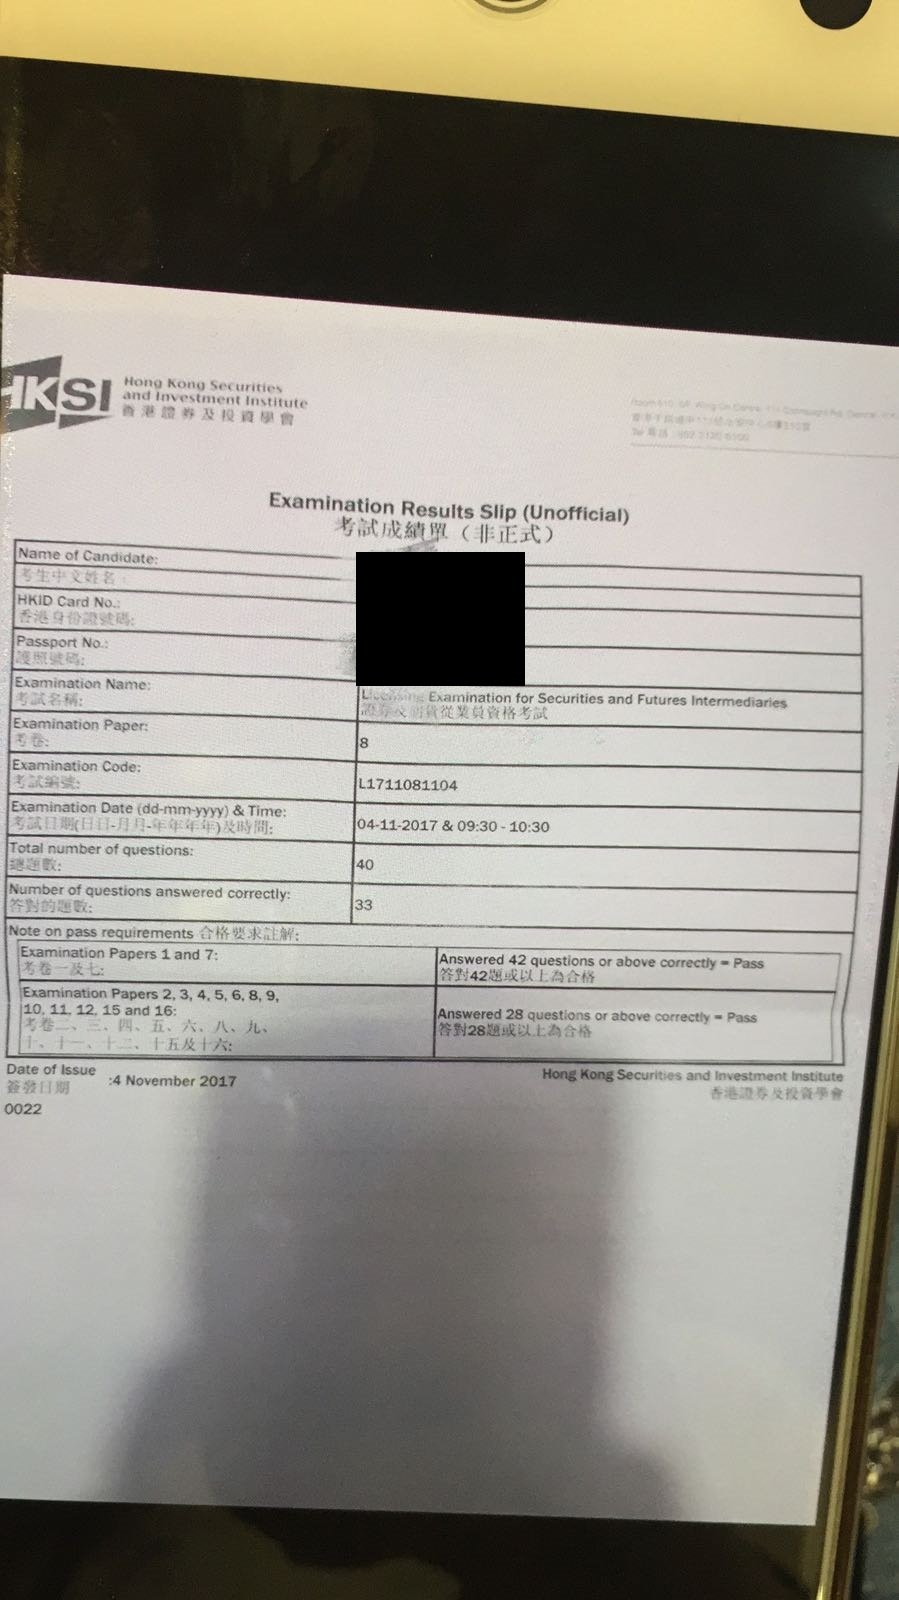 JWZ 4/11/2017 LE Paper 8 證券期貨從業員資格考試卷八 Pass